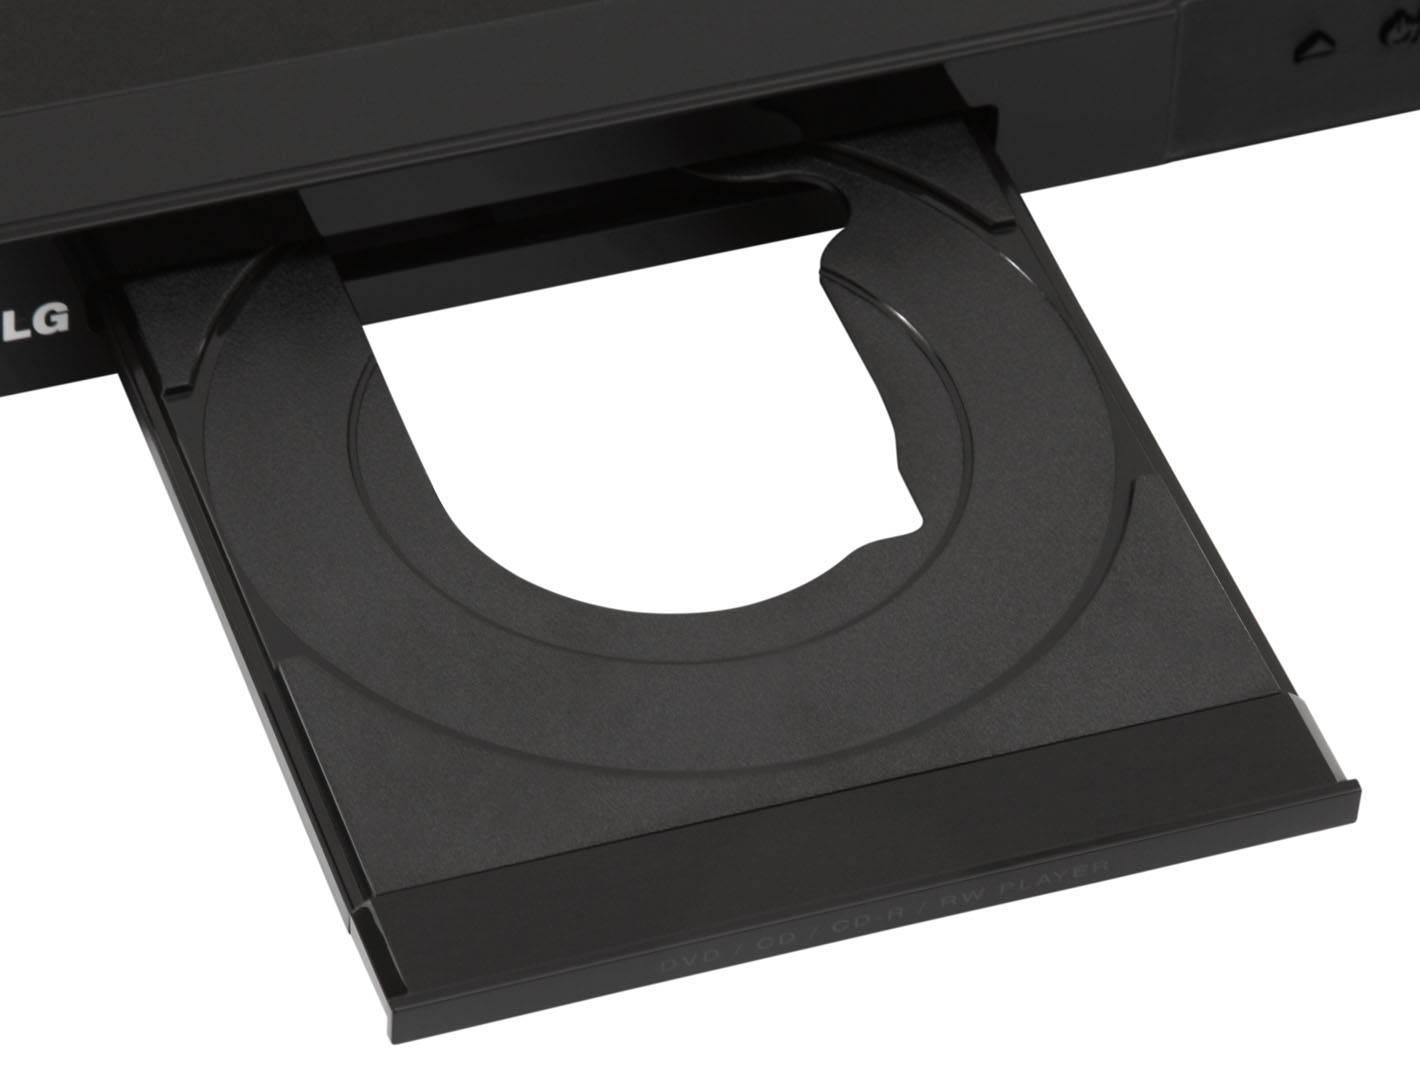 Dvd Player LG DP-132